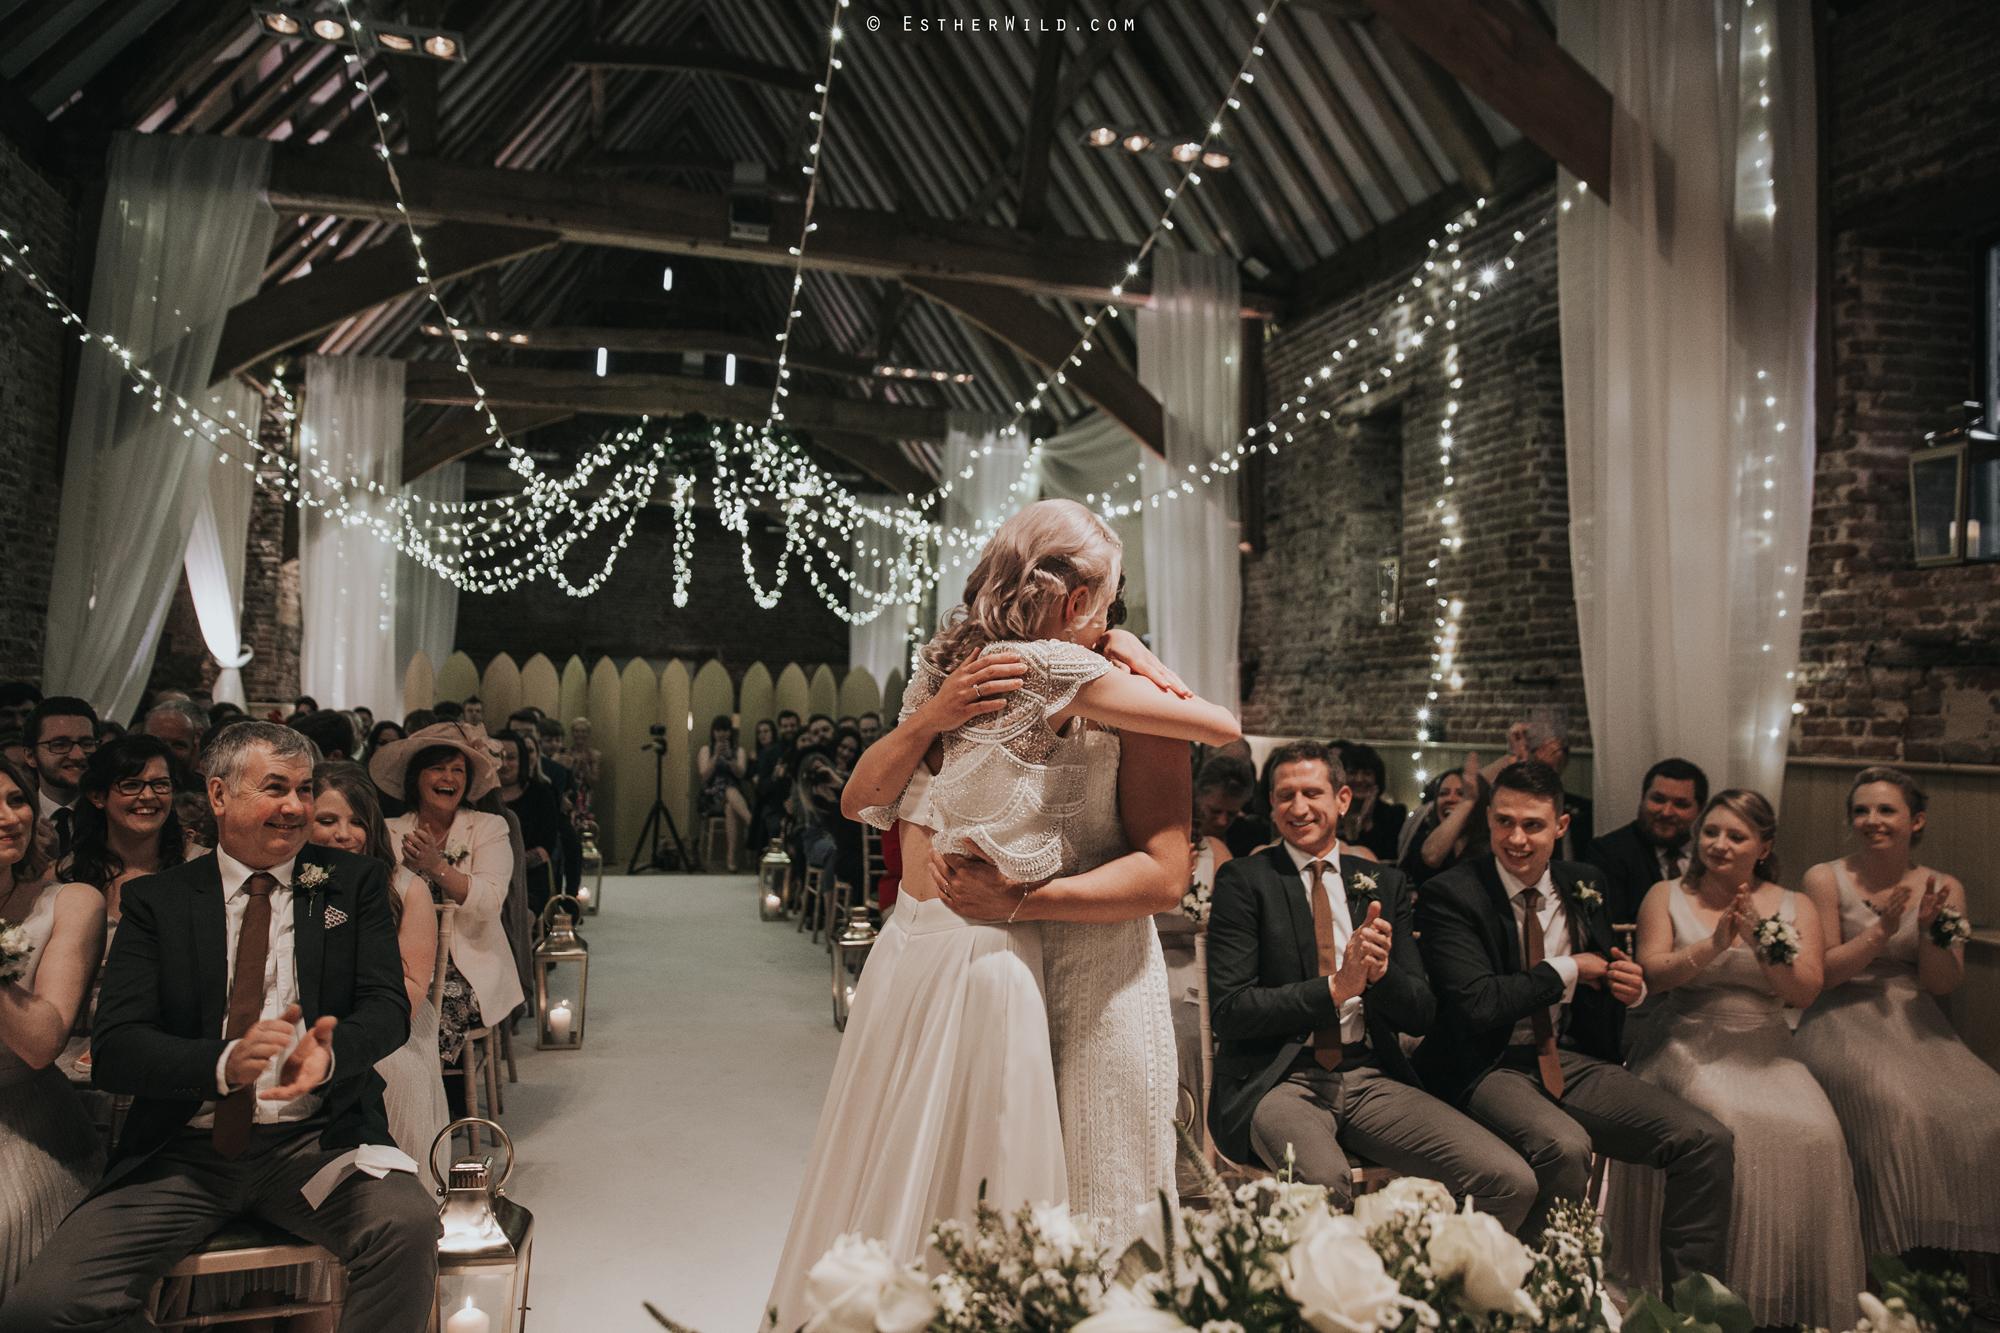 Elms_Barn_Weddings_Suffolk_Photographer_Copyright_Esther_Wild_IMG_1283.jpg